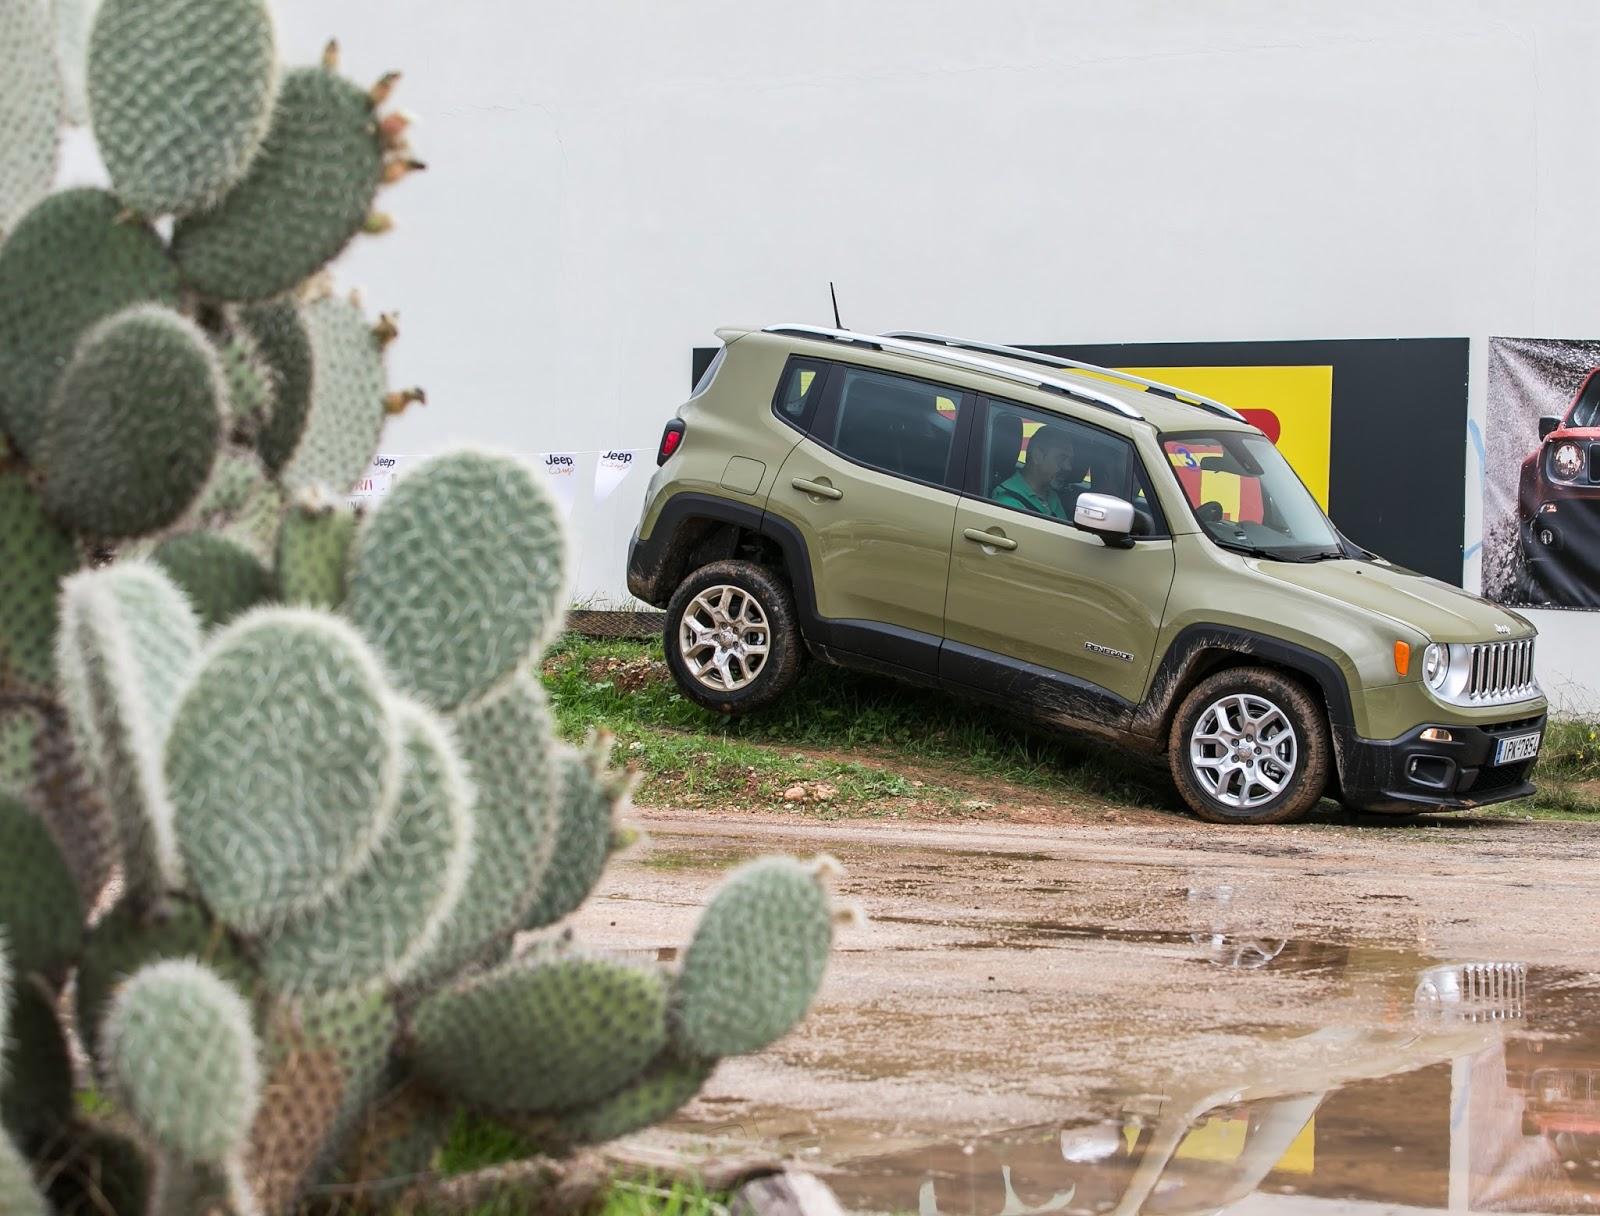 KF 1630 Πετάμε ένα Jeep Renegade σε λάσπες, πέτρες, άμμο, λίμνες. Θα τα καταφέρει; Jeep, Jeep Renegade, Renegade, SUV, TEST, zblog, ΔΟΚΙΜΕΣ